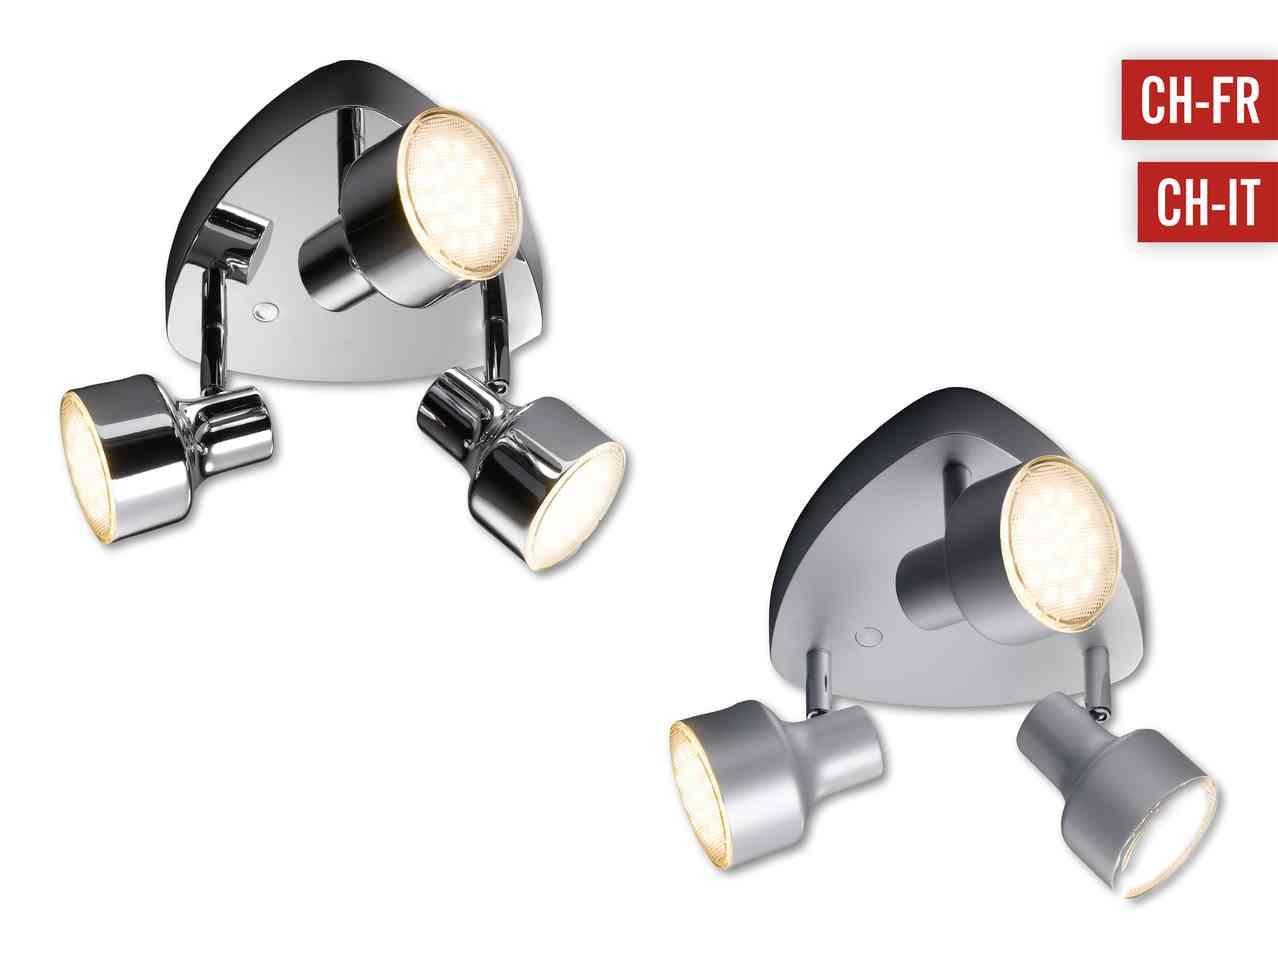 soffitto Lidl LED a da Lampada PX80nwOk